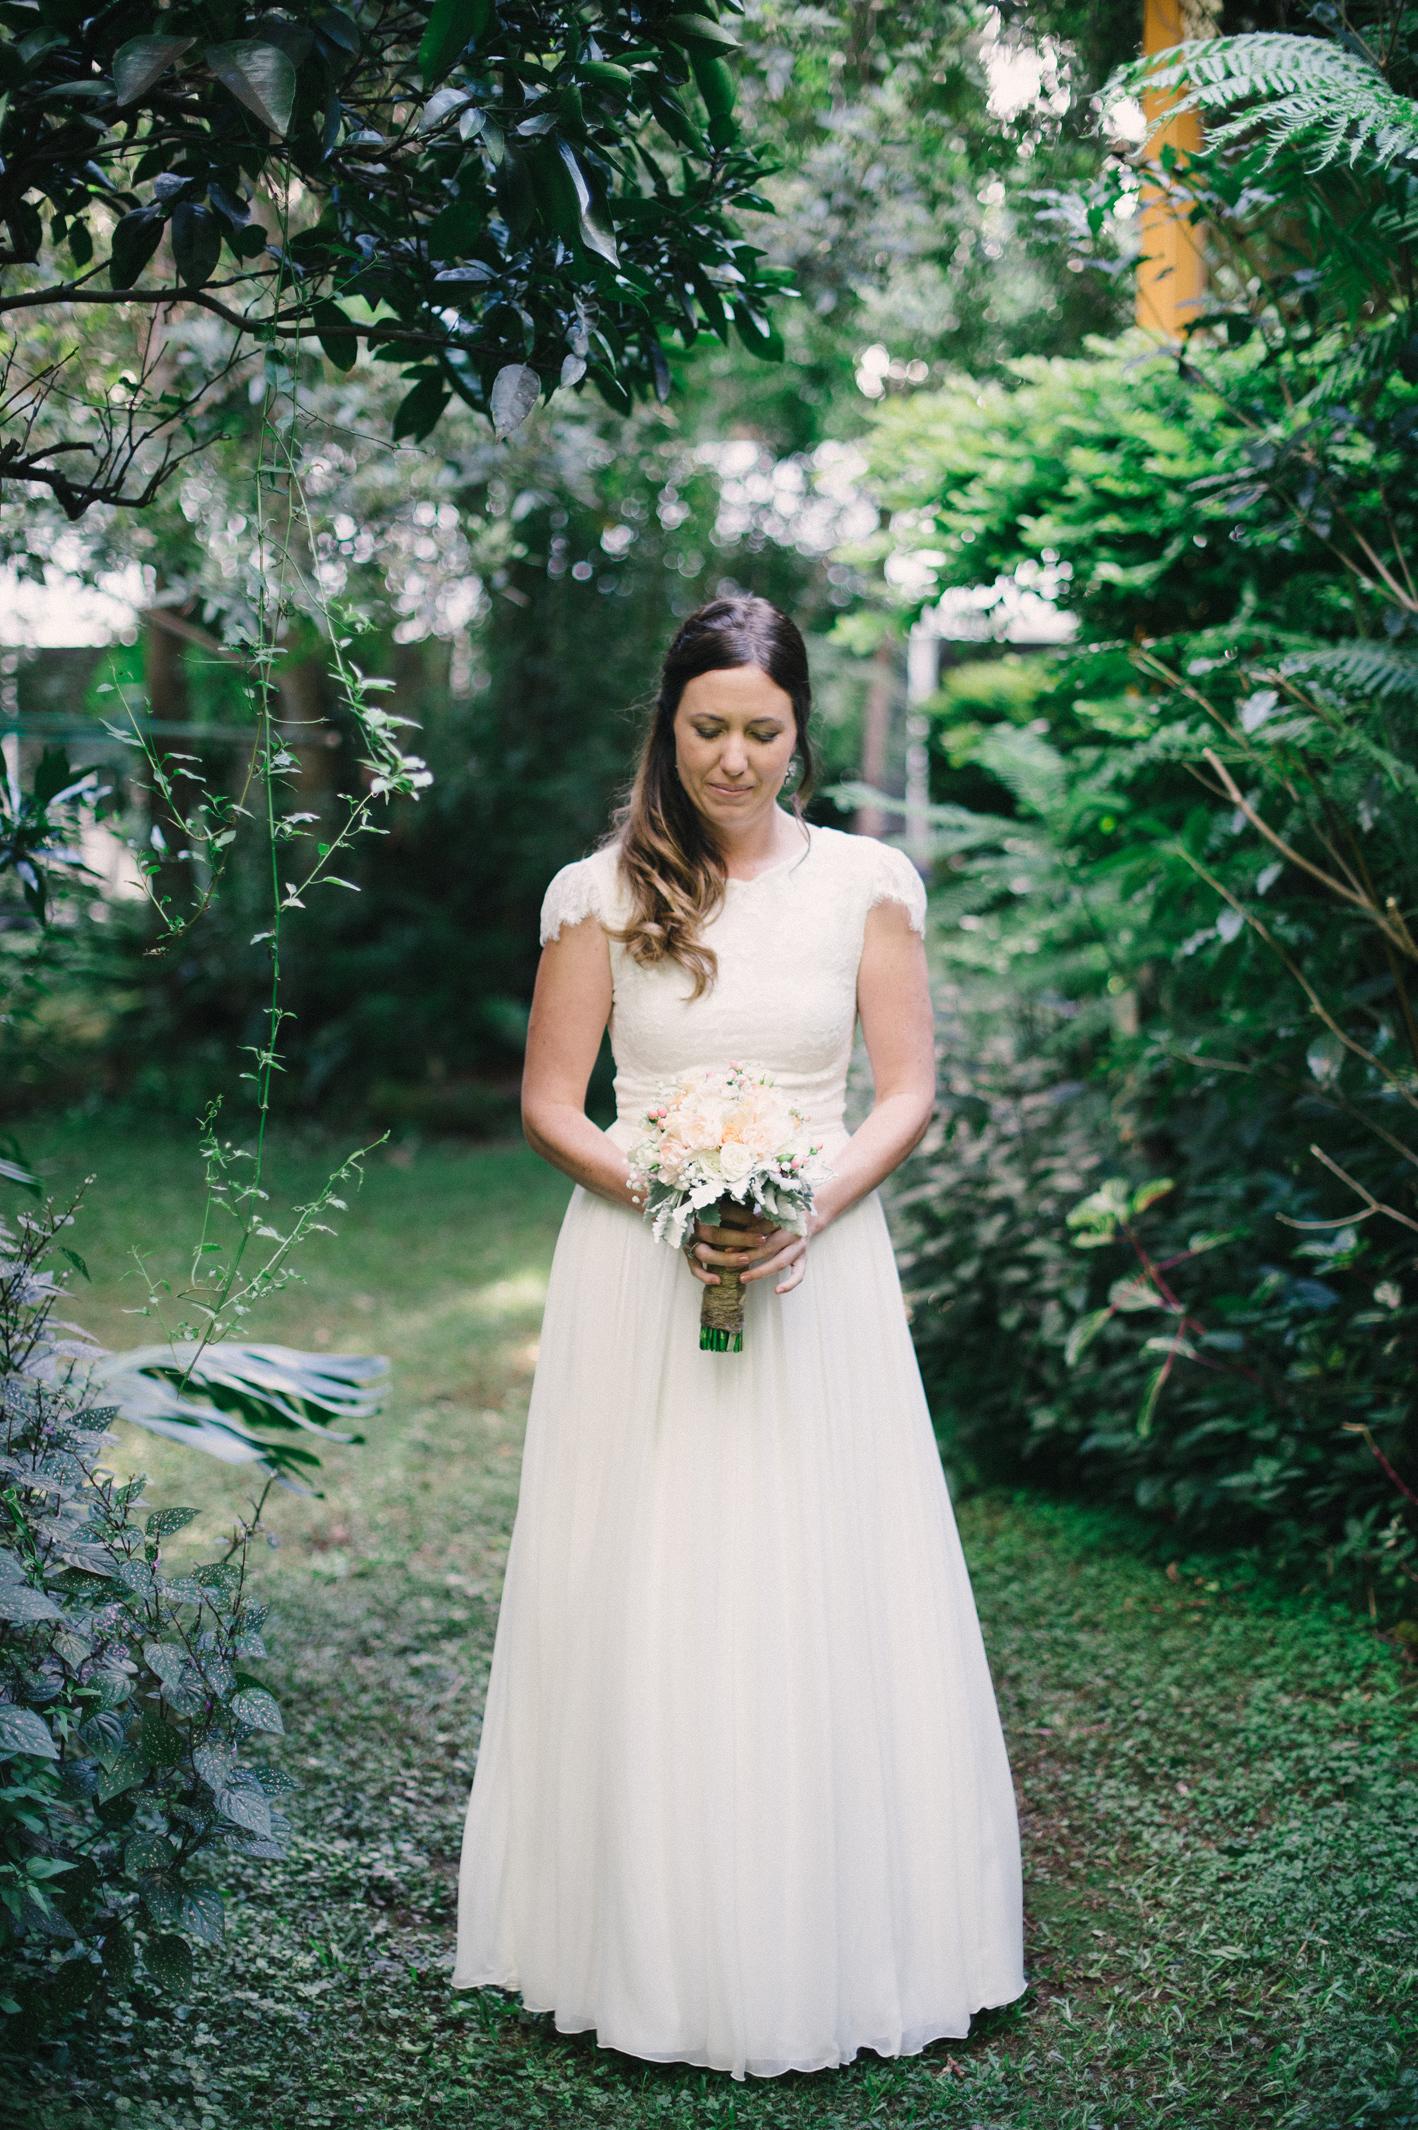 013-michelle-reagan-mount-tamborine-wedding-sophie-baker-photography